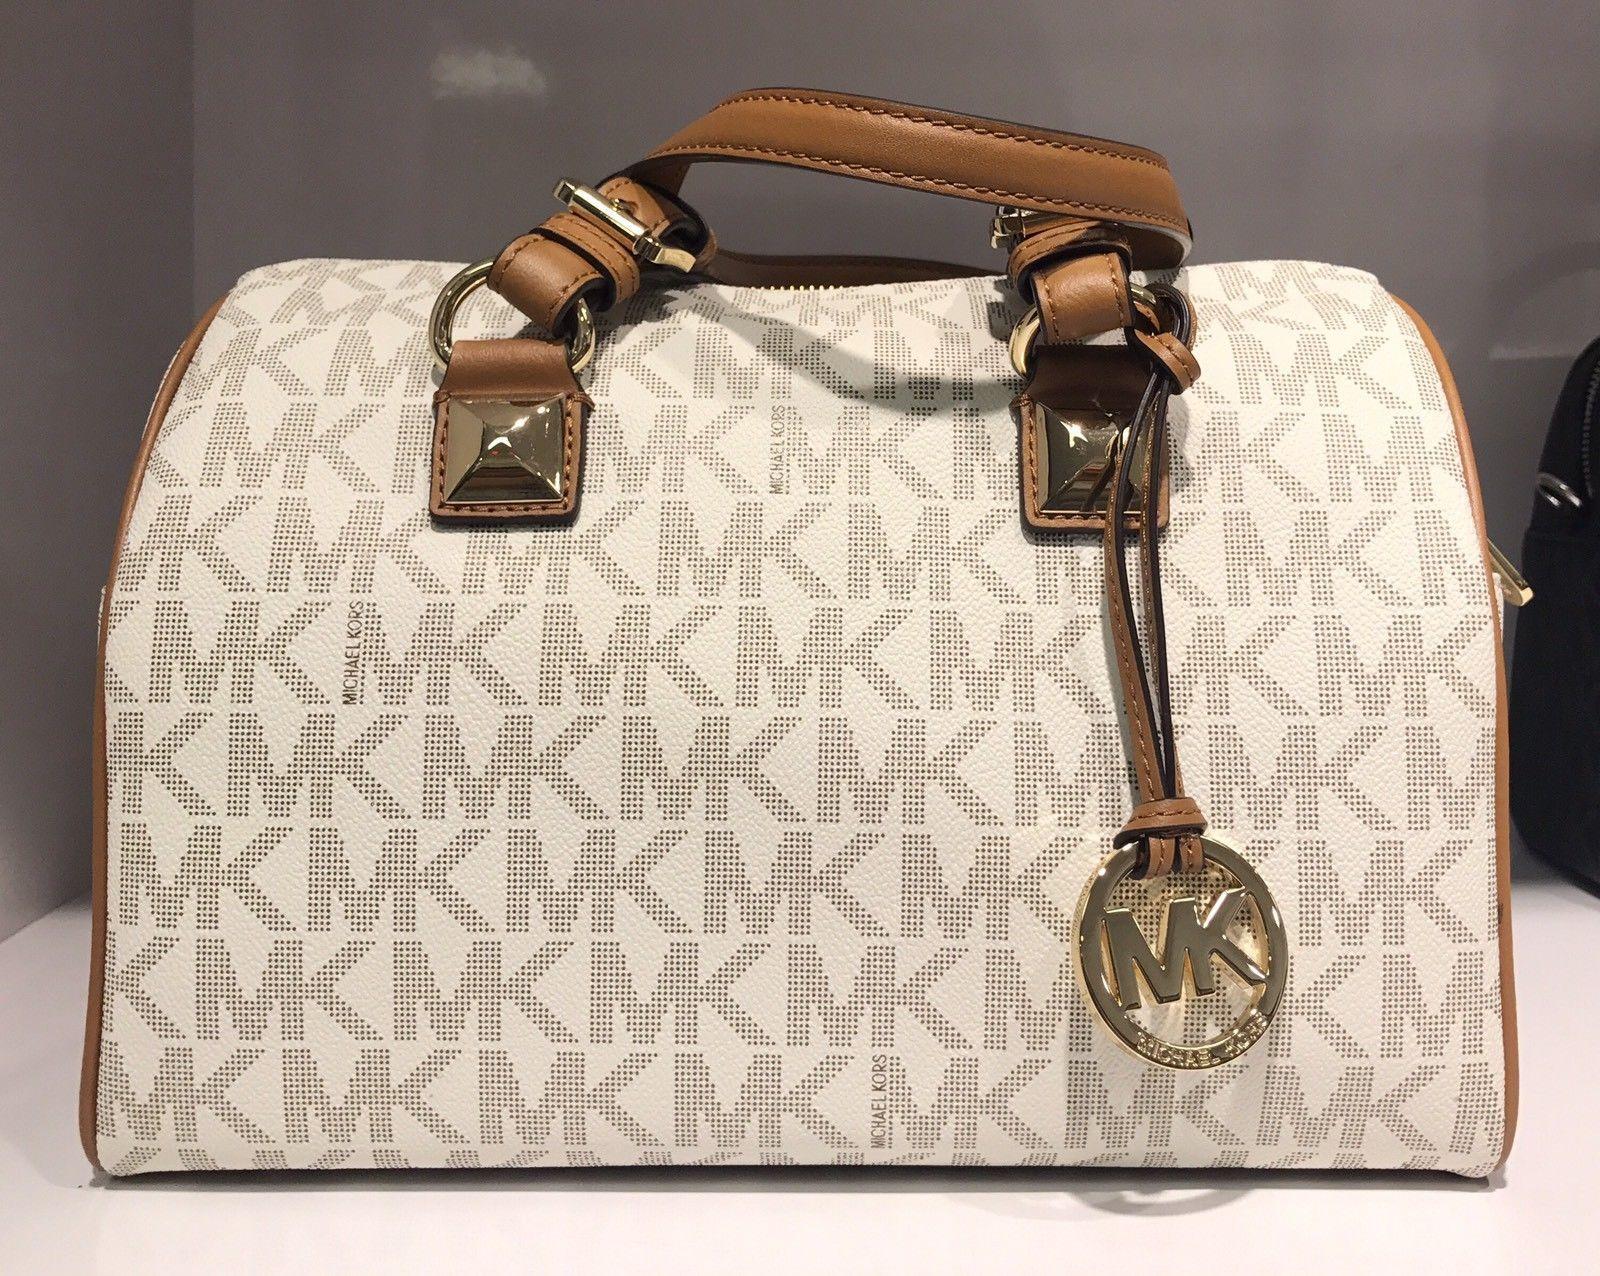 MICHAEL Michael Kors Medium Grayson Vanilla MK LOGO Satchel Bag $159.98